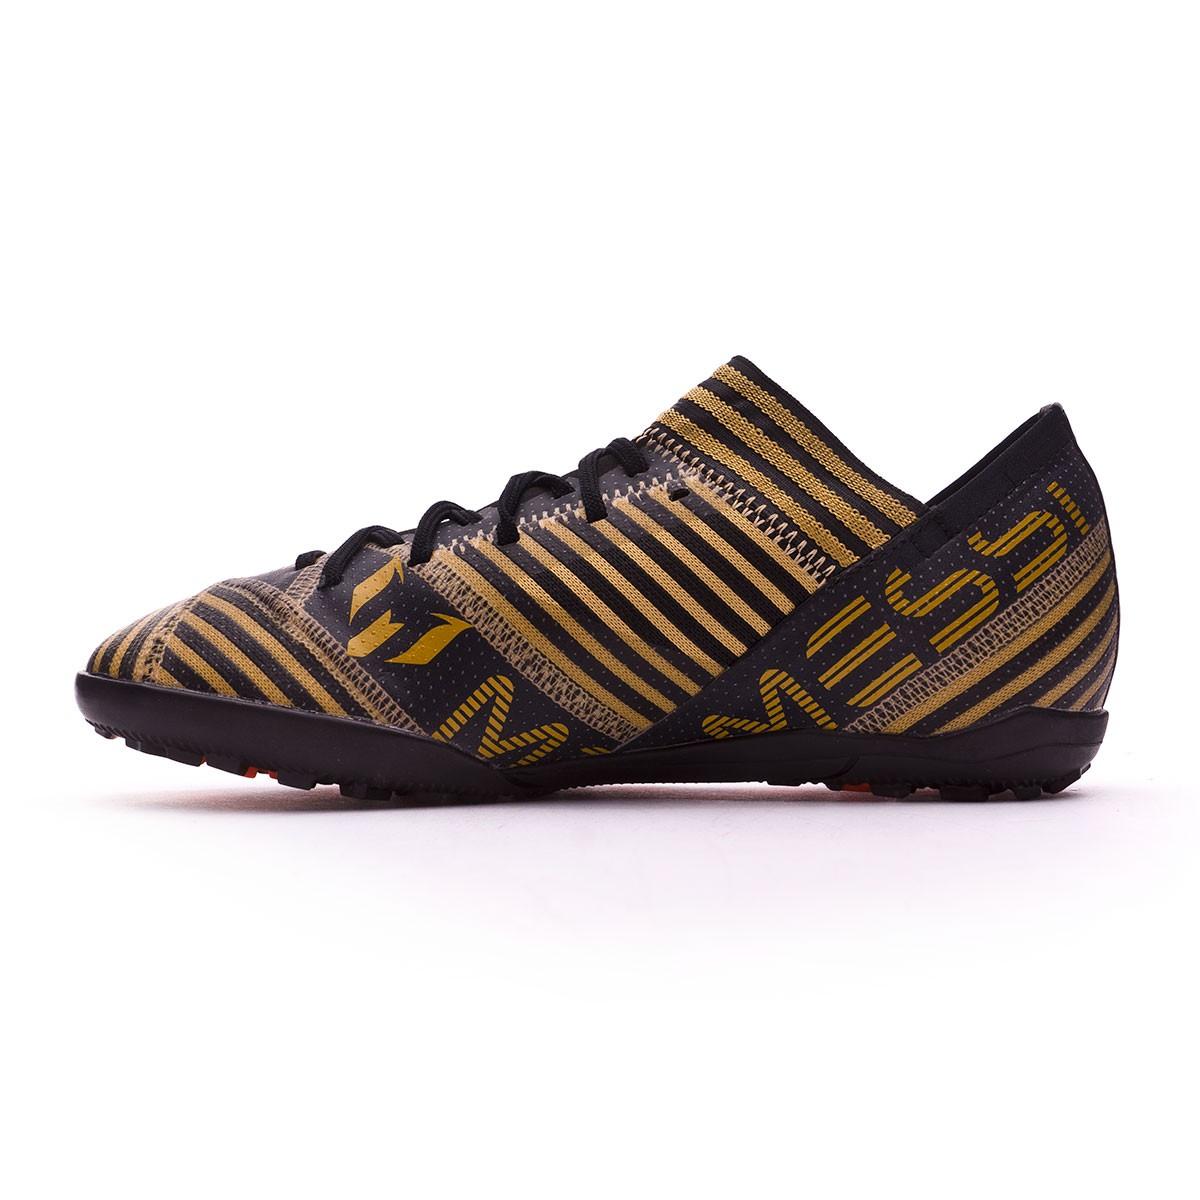 big sale 2769b c9079 Football Boot adidas Kids Nemeziz Messi Tango 17.3 Turf Core black-Solar  red-Tactile gold metallic - Soloporteros es ahora Fútbol Emotion